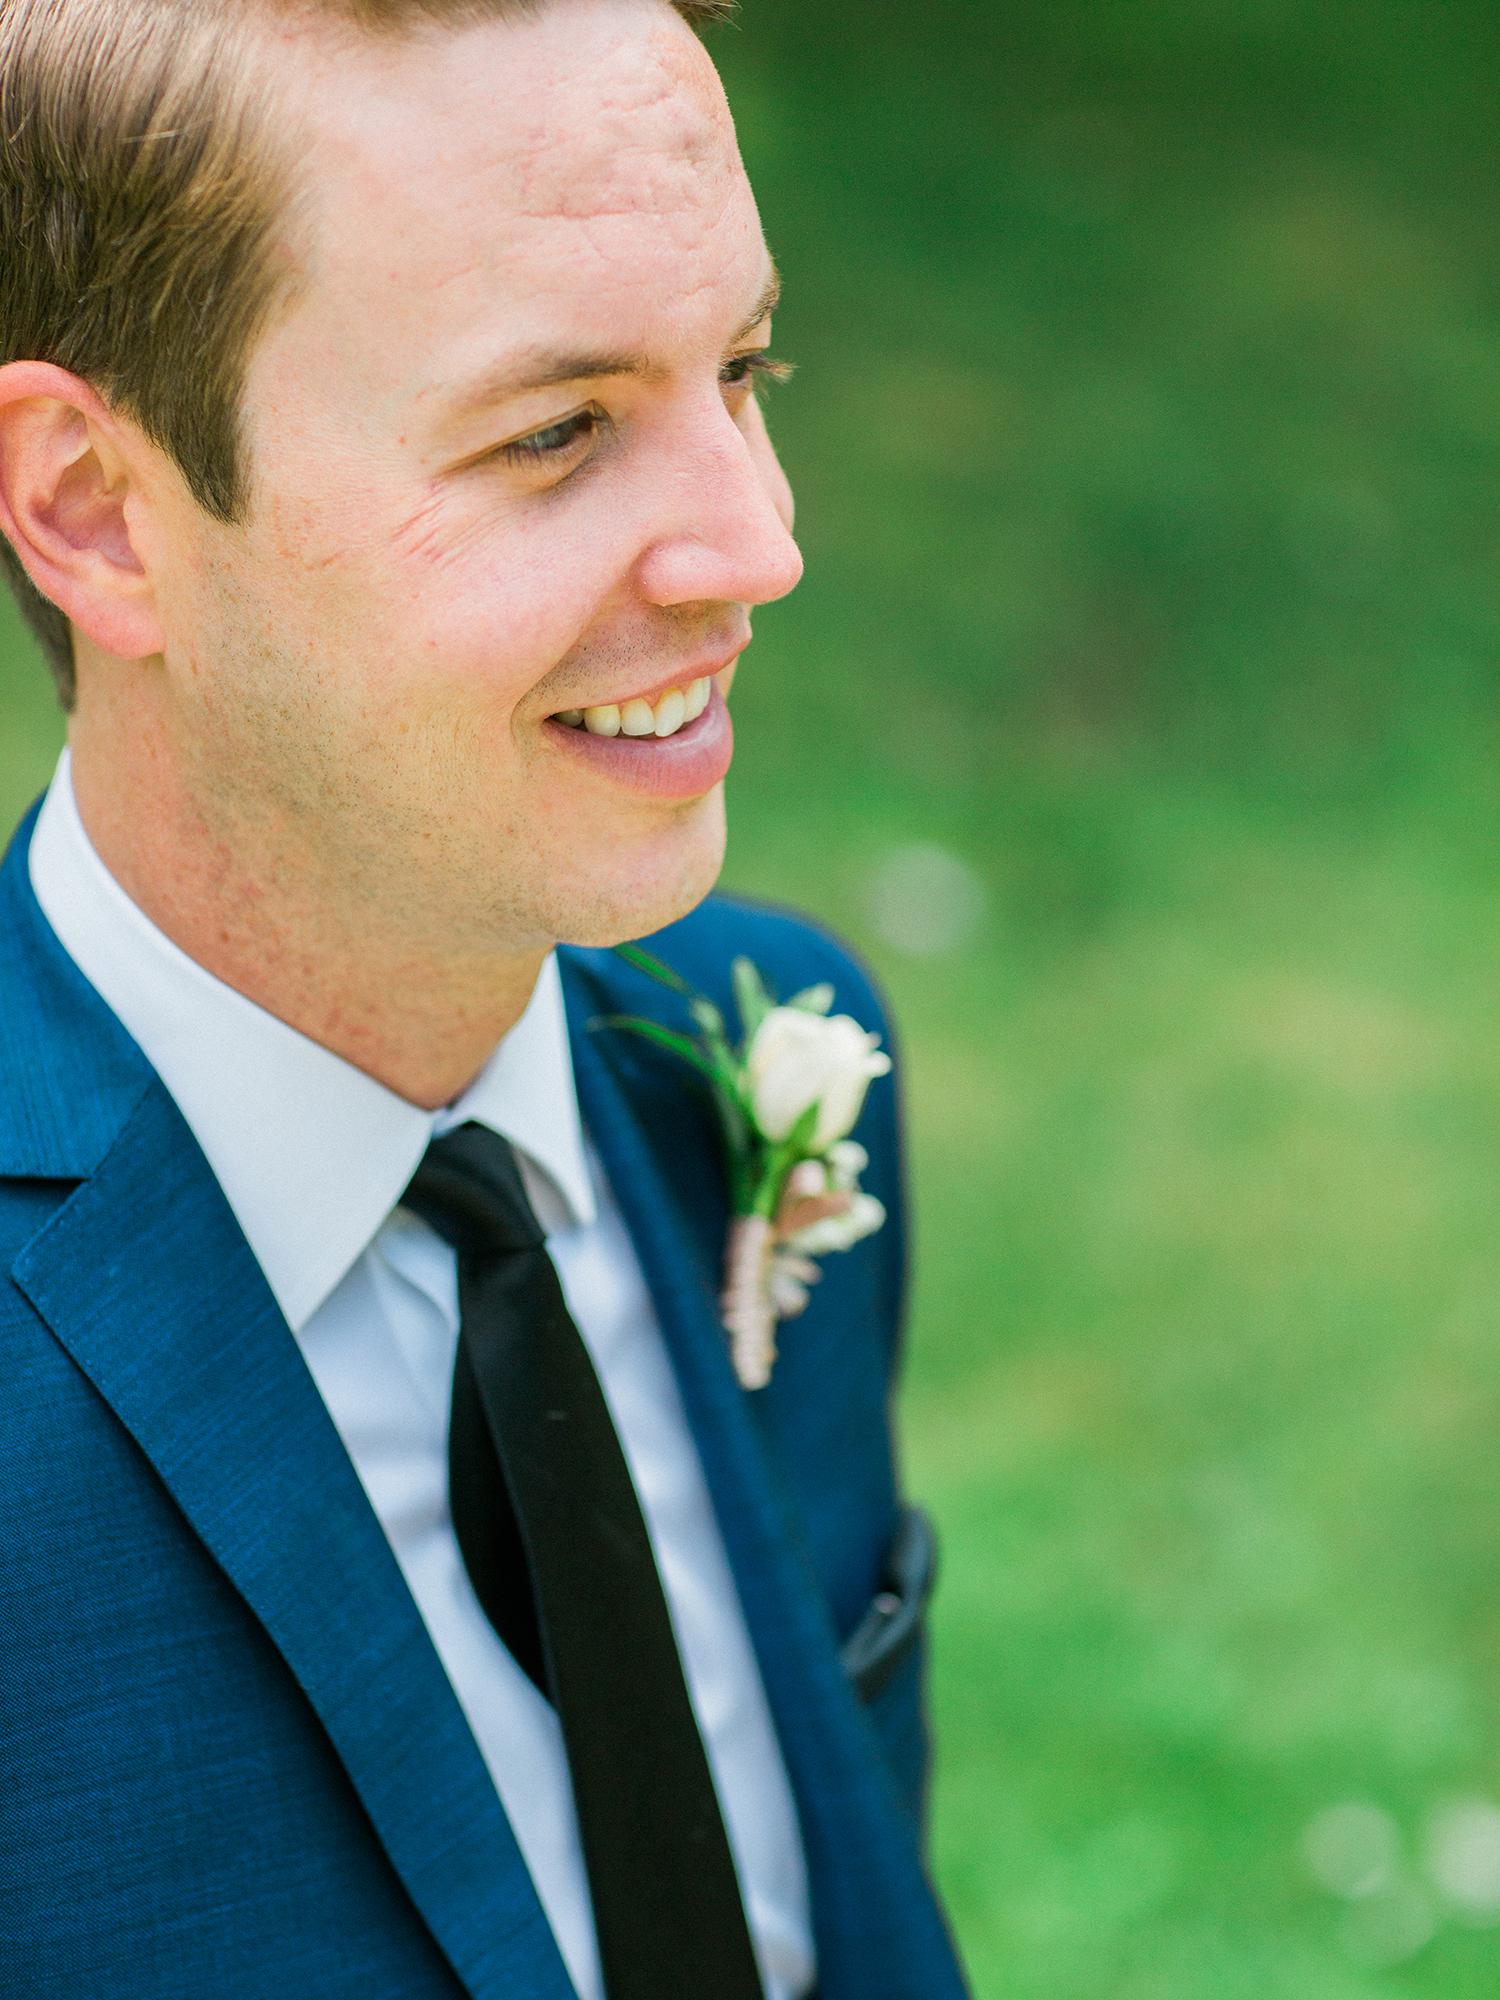 MeganMikeCuff_Wedding